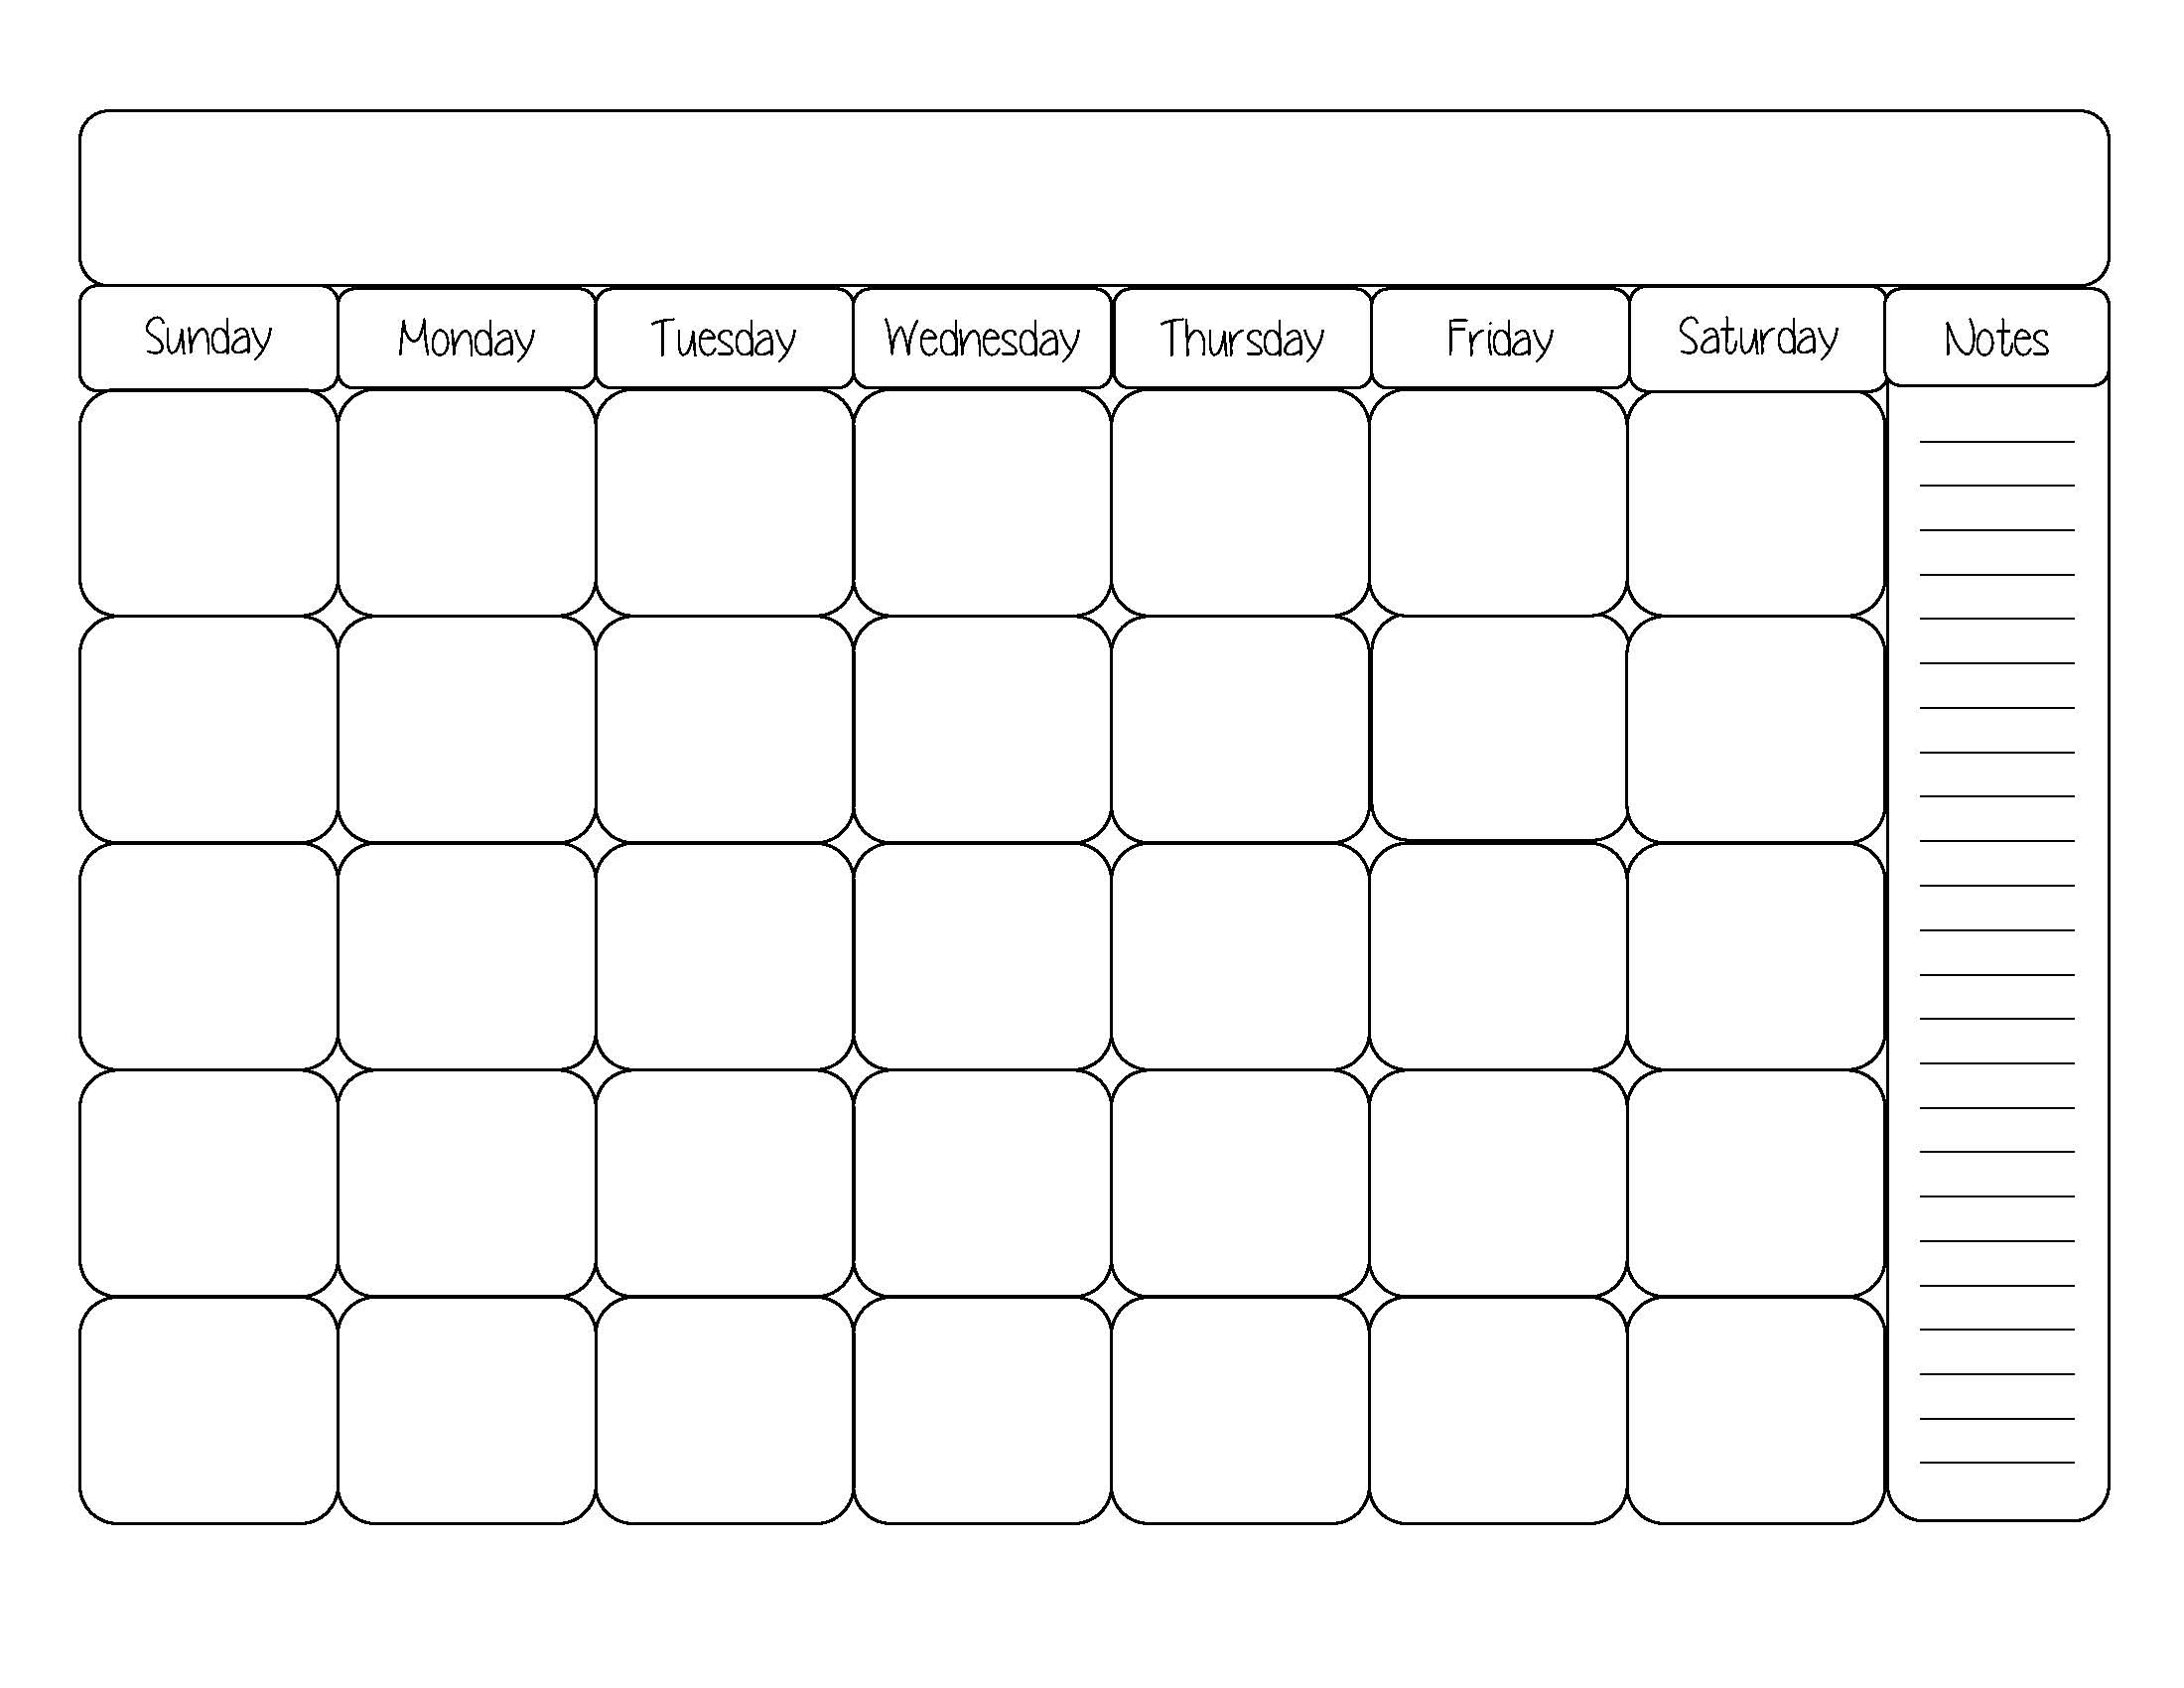 1000+ images about Calendars on Pinterest | Blank calendar